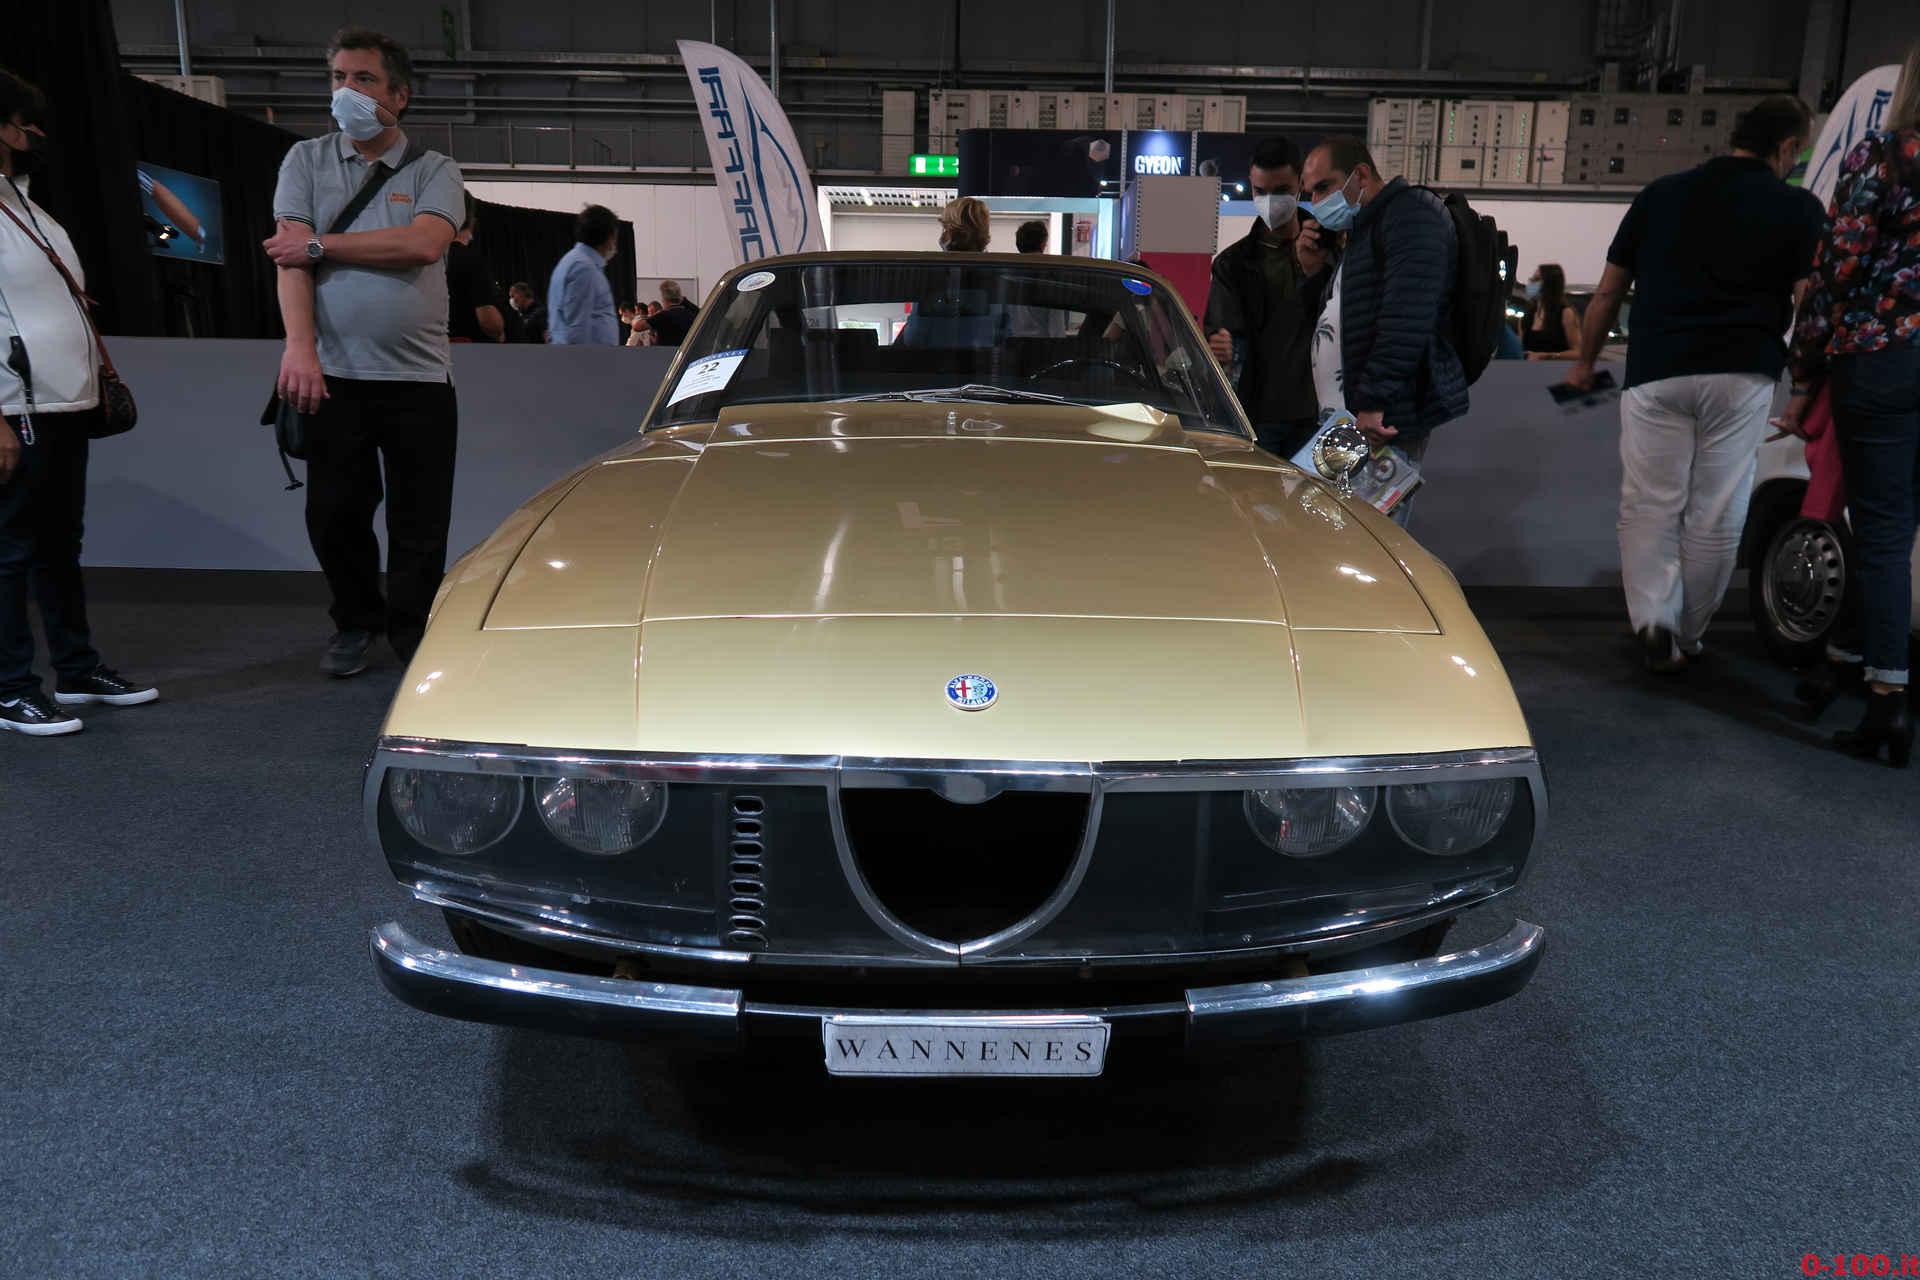 Milano_autoclassica_2021-100_47